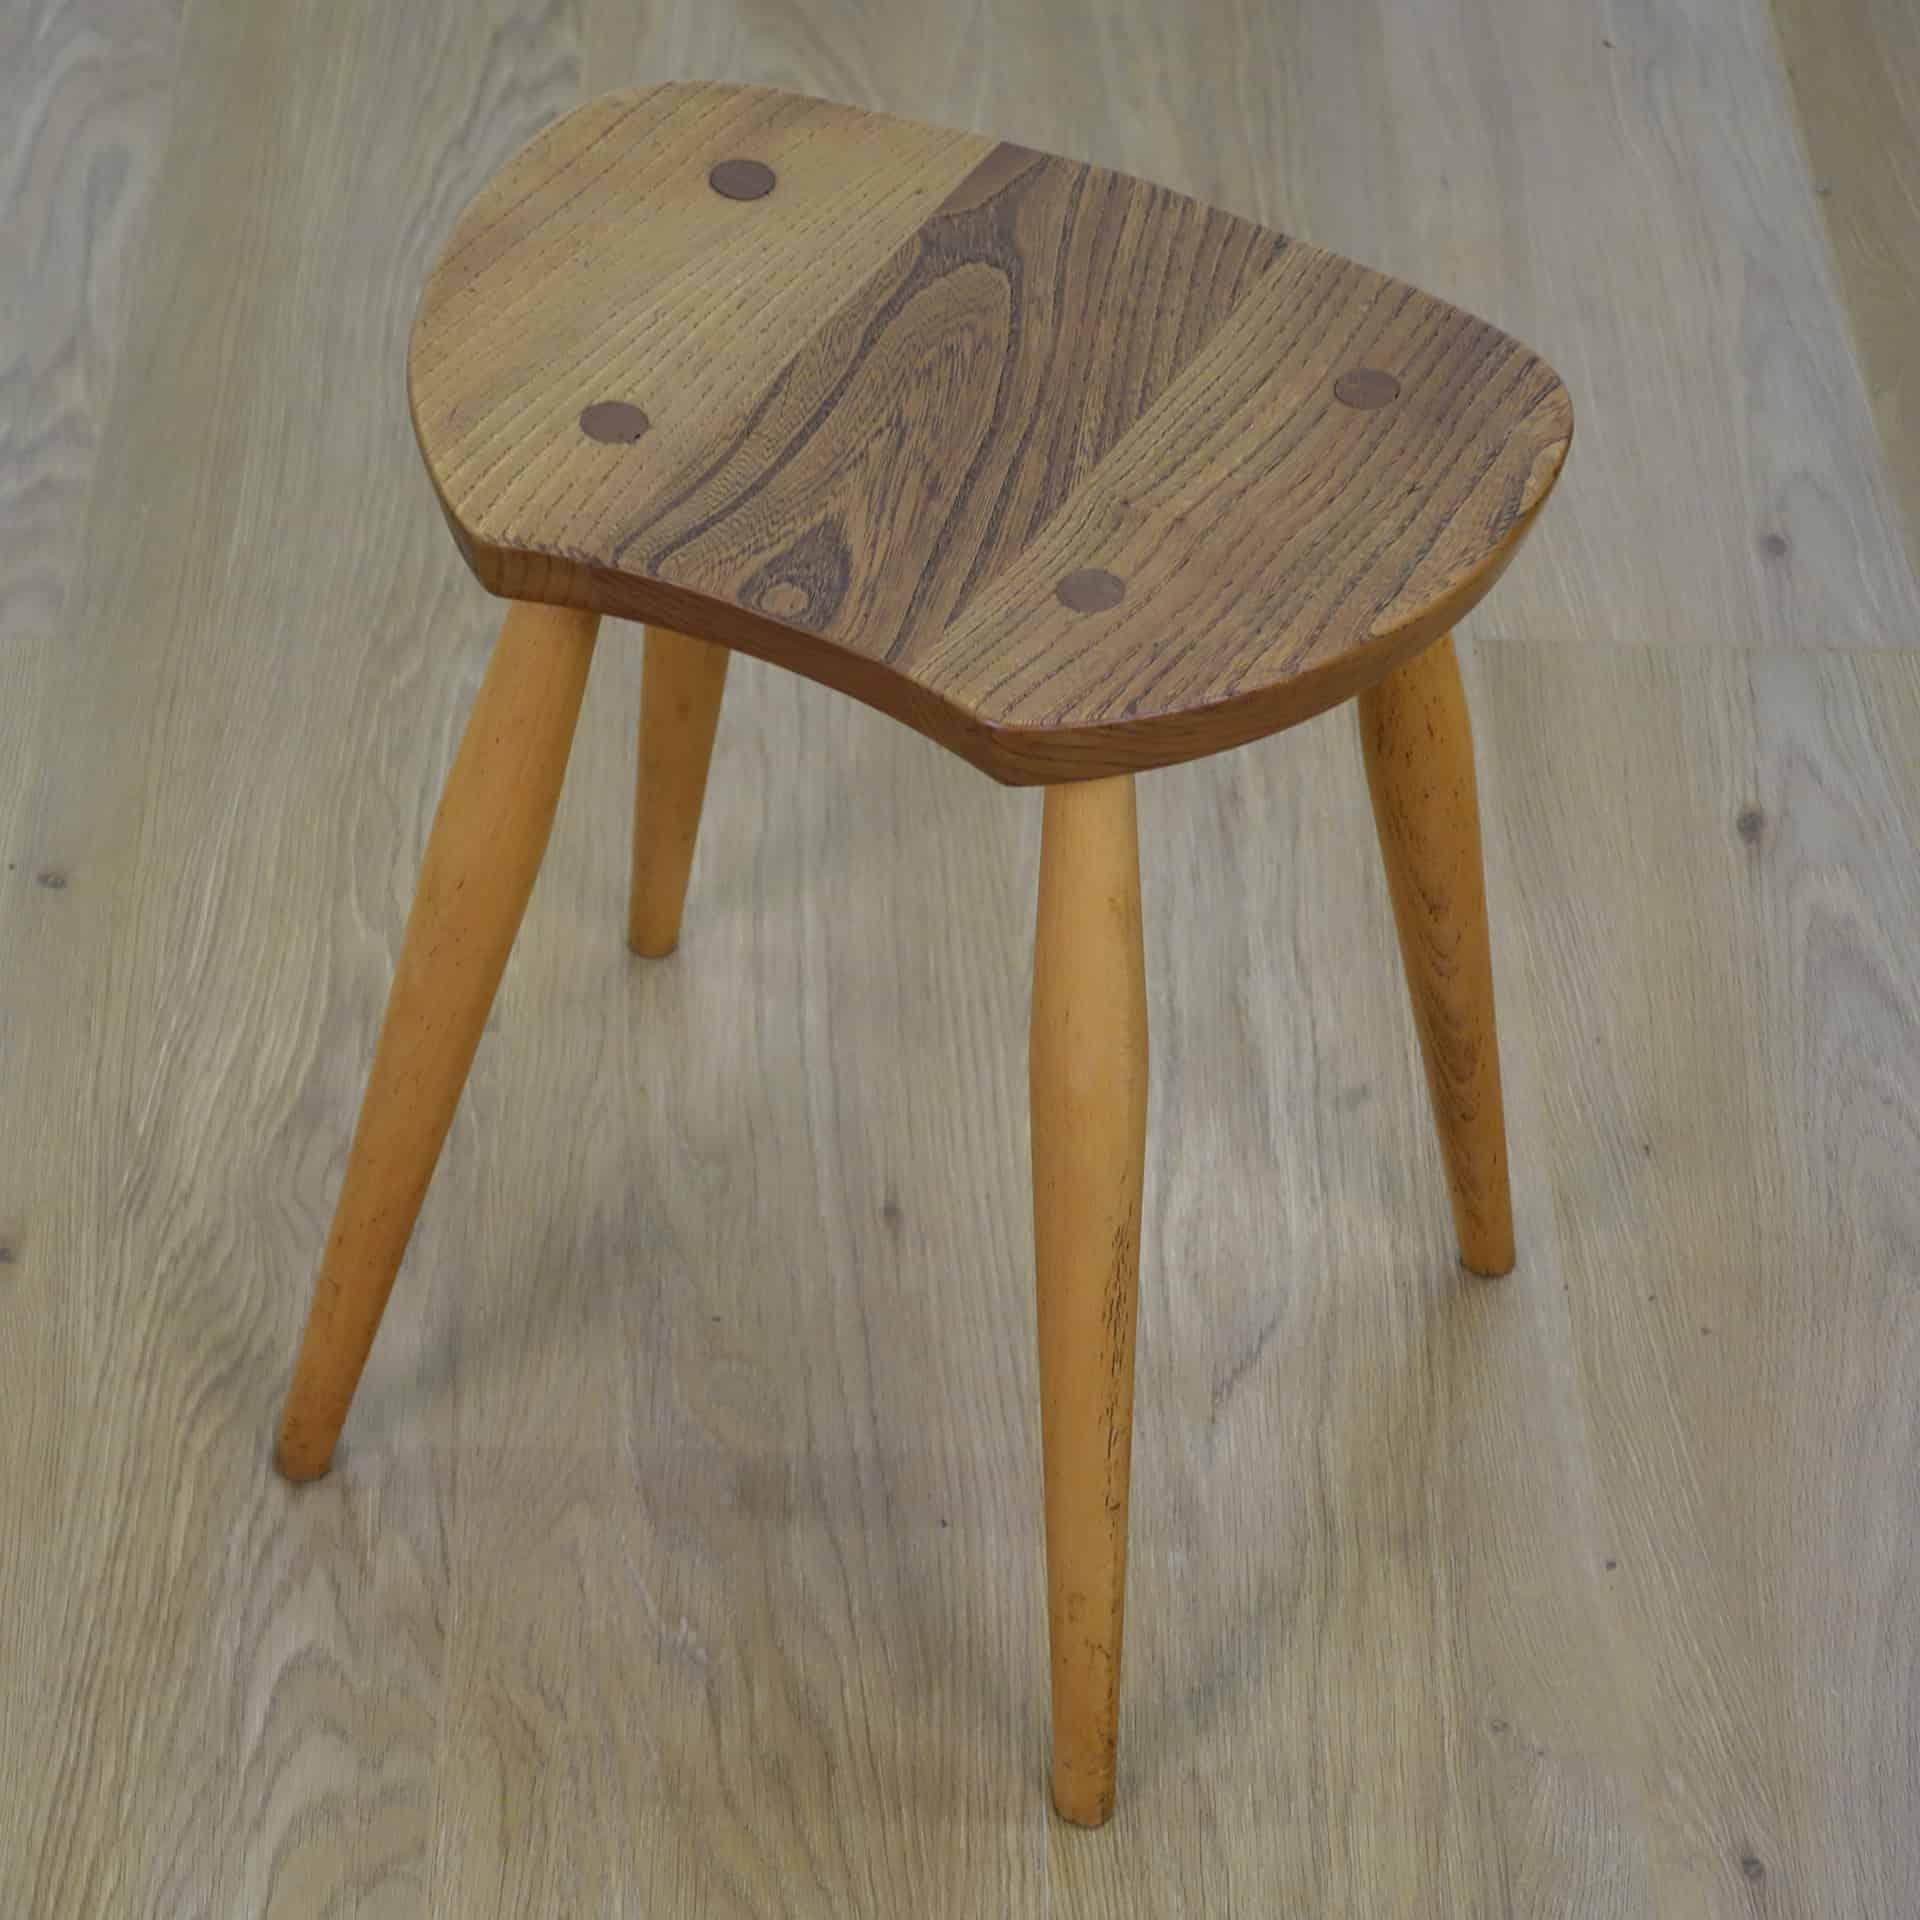 Rare 1960s Ercol saddle stool